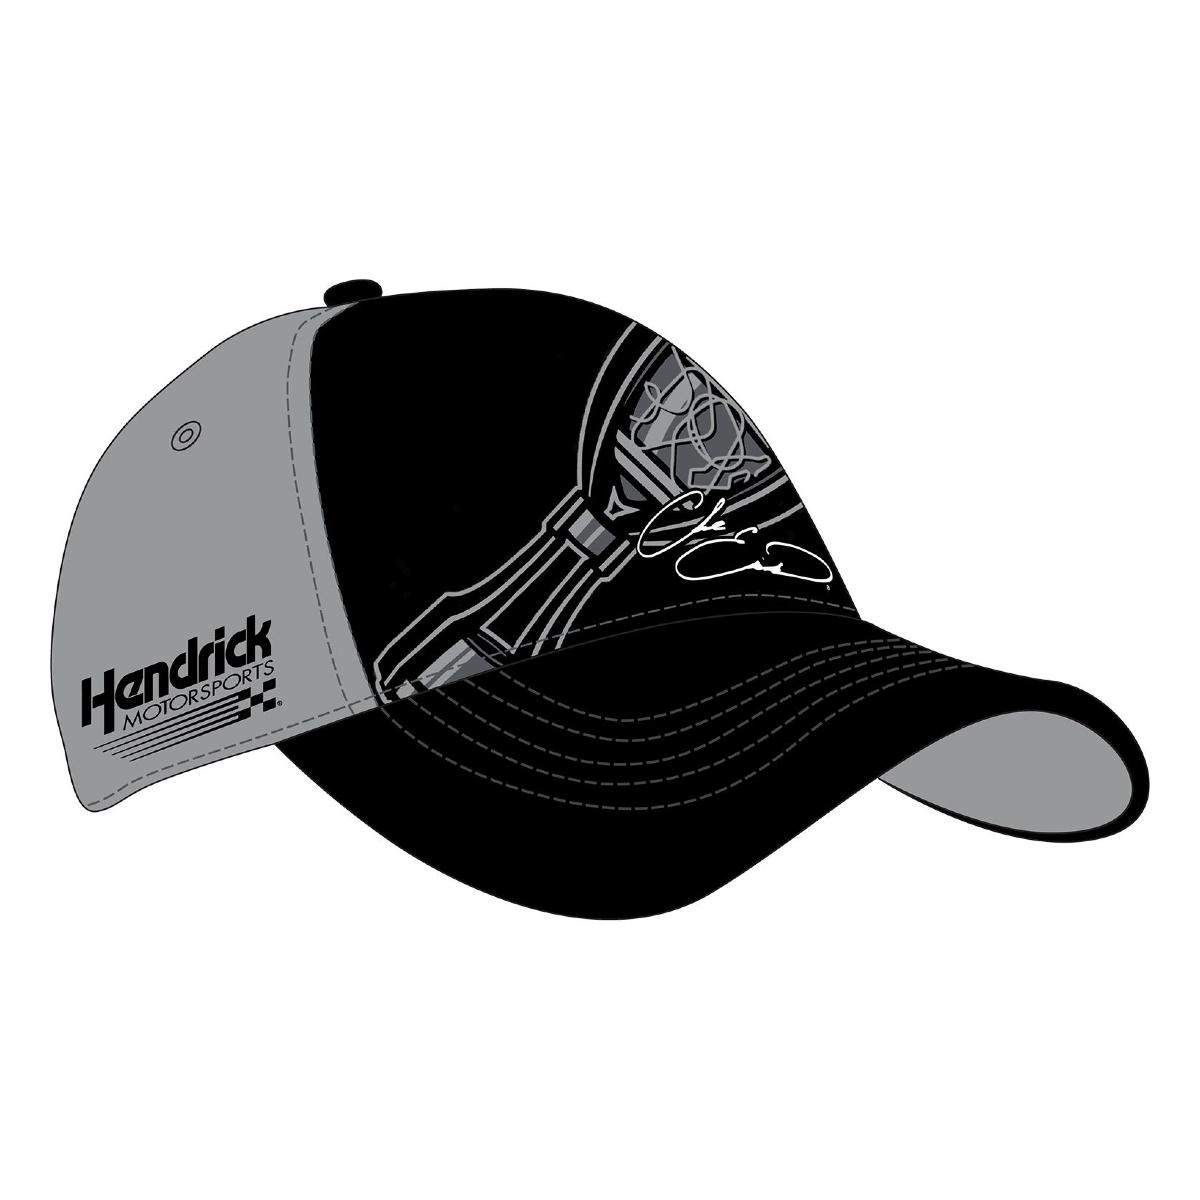 2020 NASCAR Champ Chase Elliott  - Adult Trophy Hat